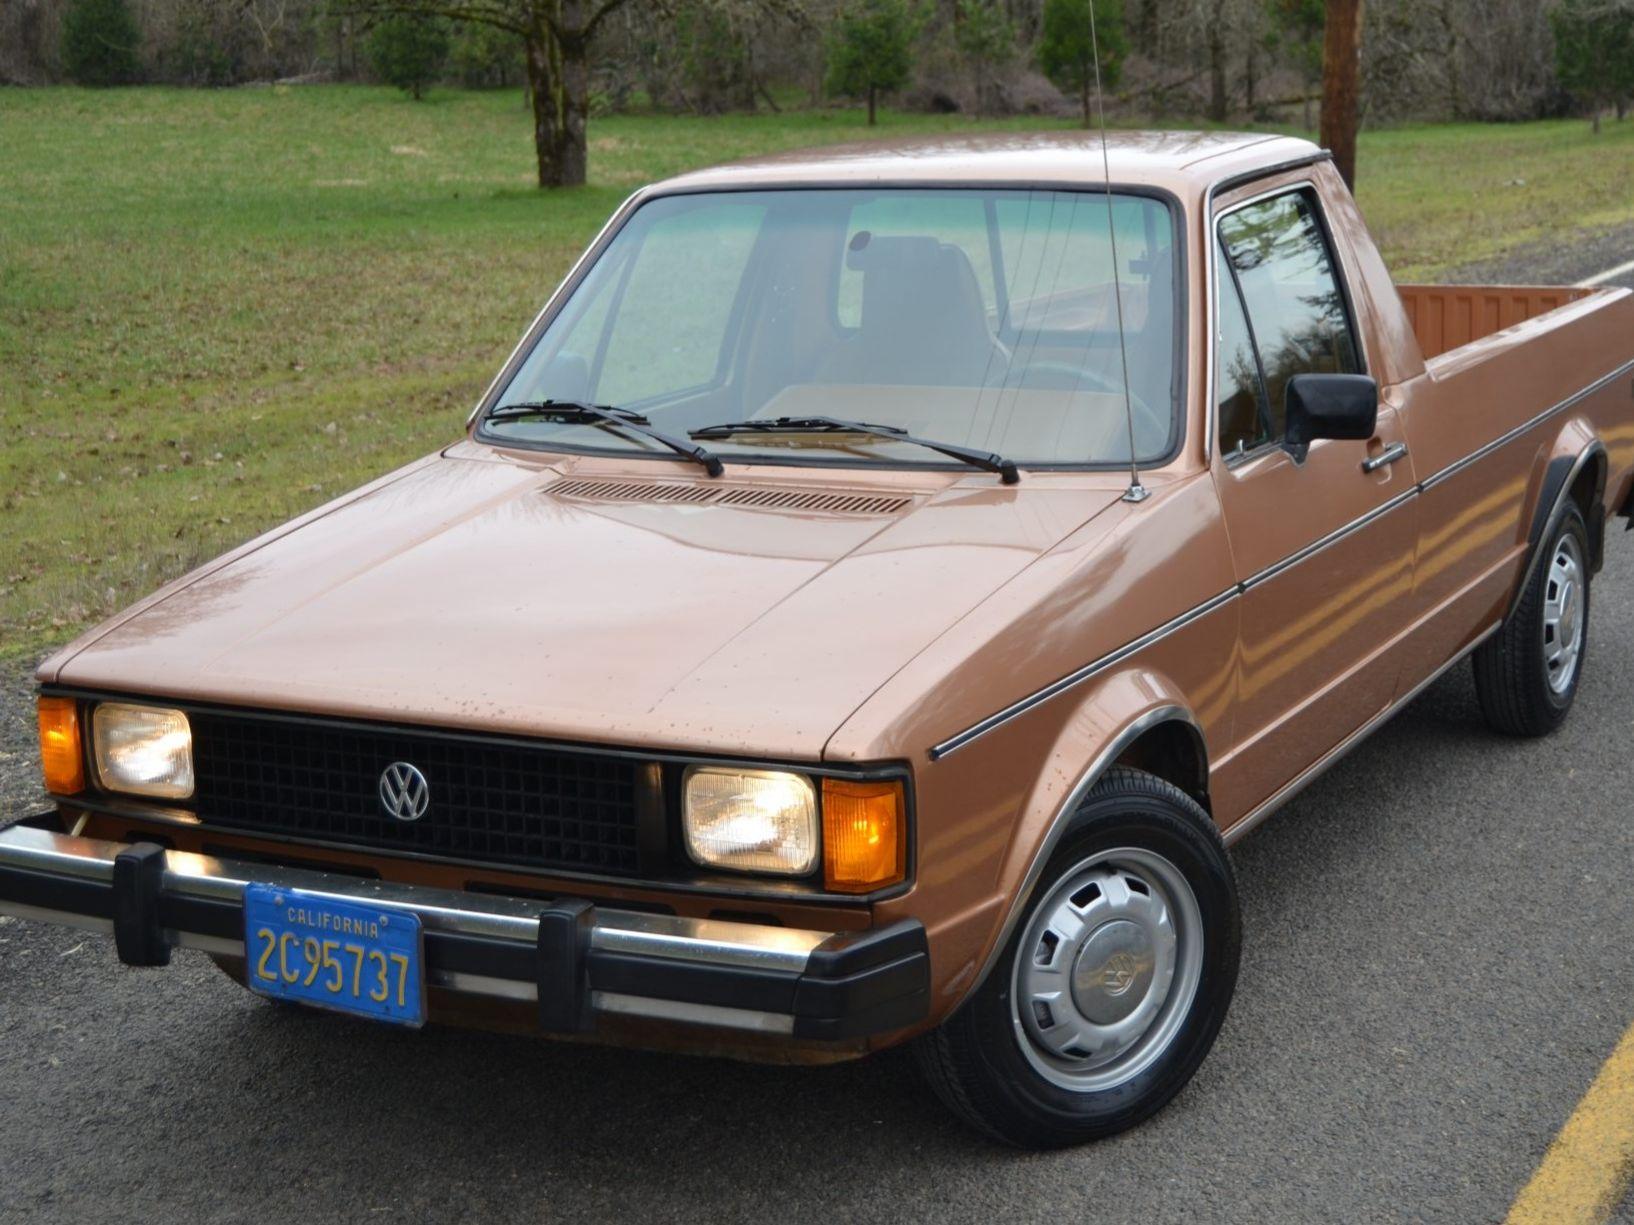 1982 Volkswagen Rabbit Pickup Diesel 5-Speed